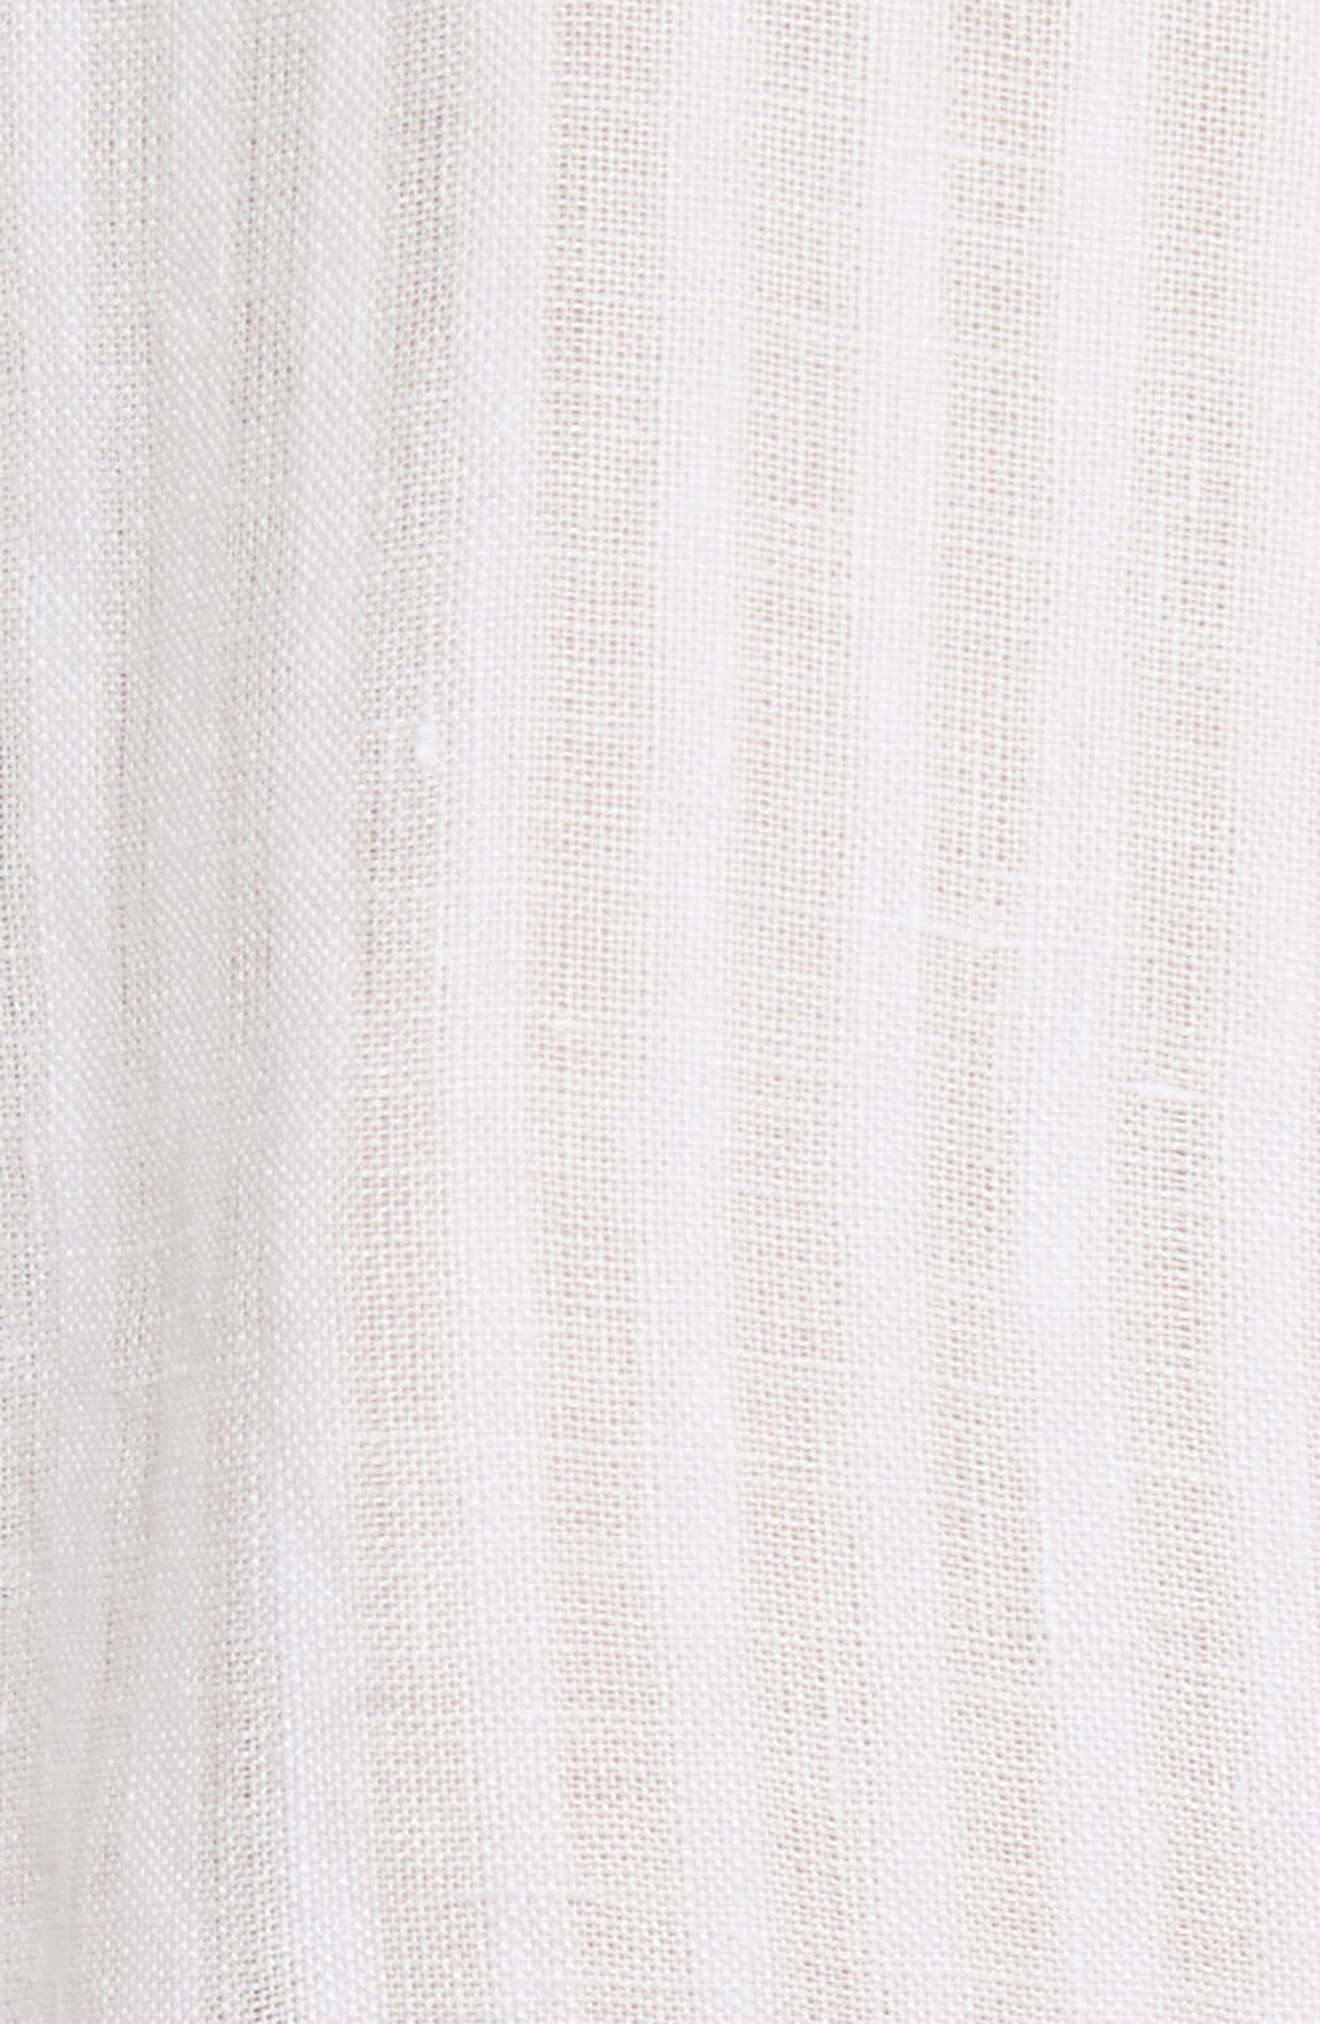 Belted Linen Dress,                             Alternate thumbnail 5, color,                             199